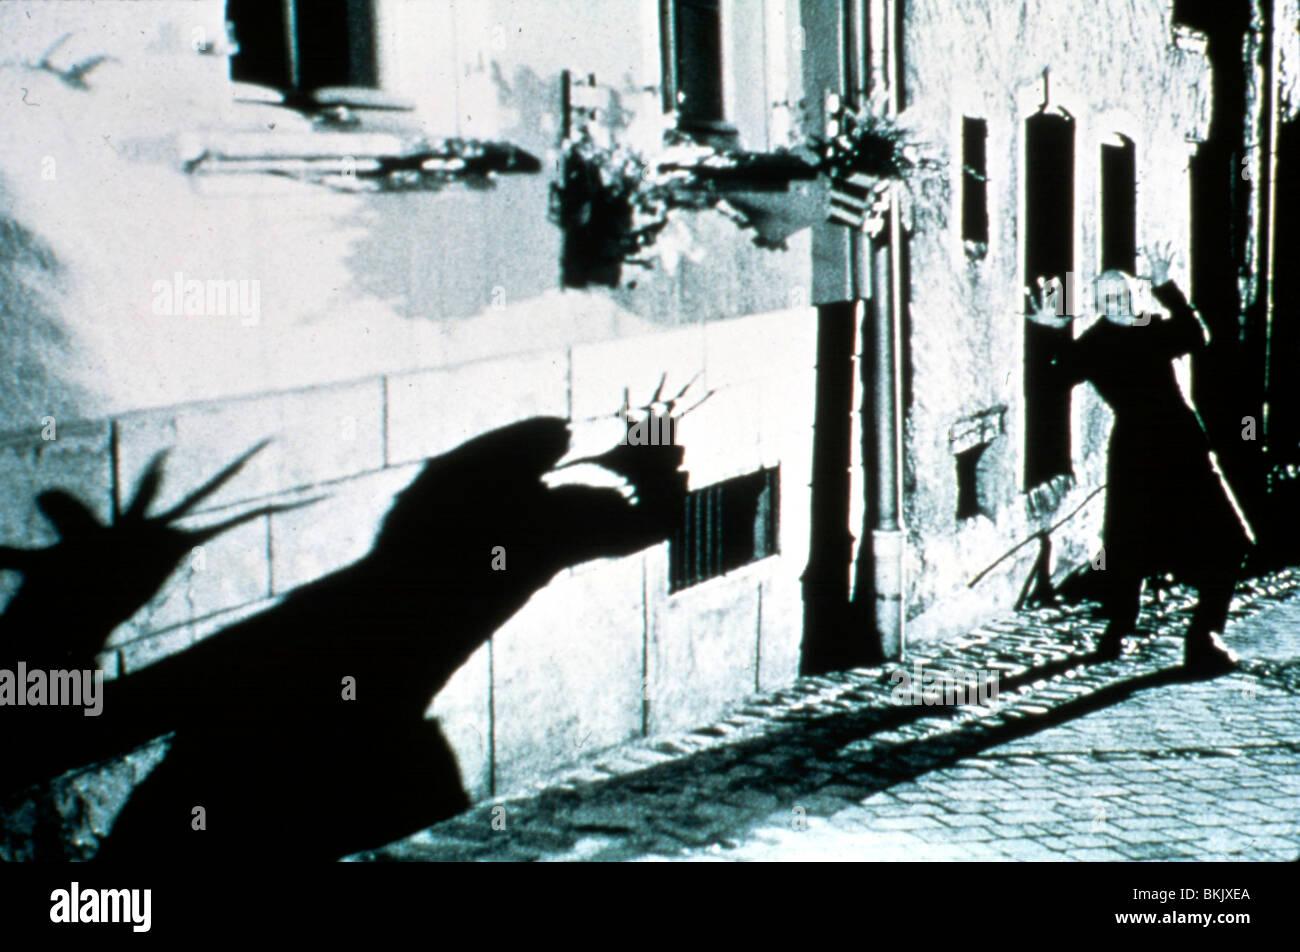 SHADOW OF THE VAMPIRE (2000) Willem Dafoe SHVA 063 Photo Stock